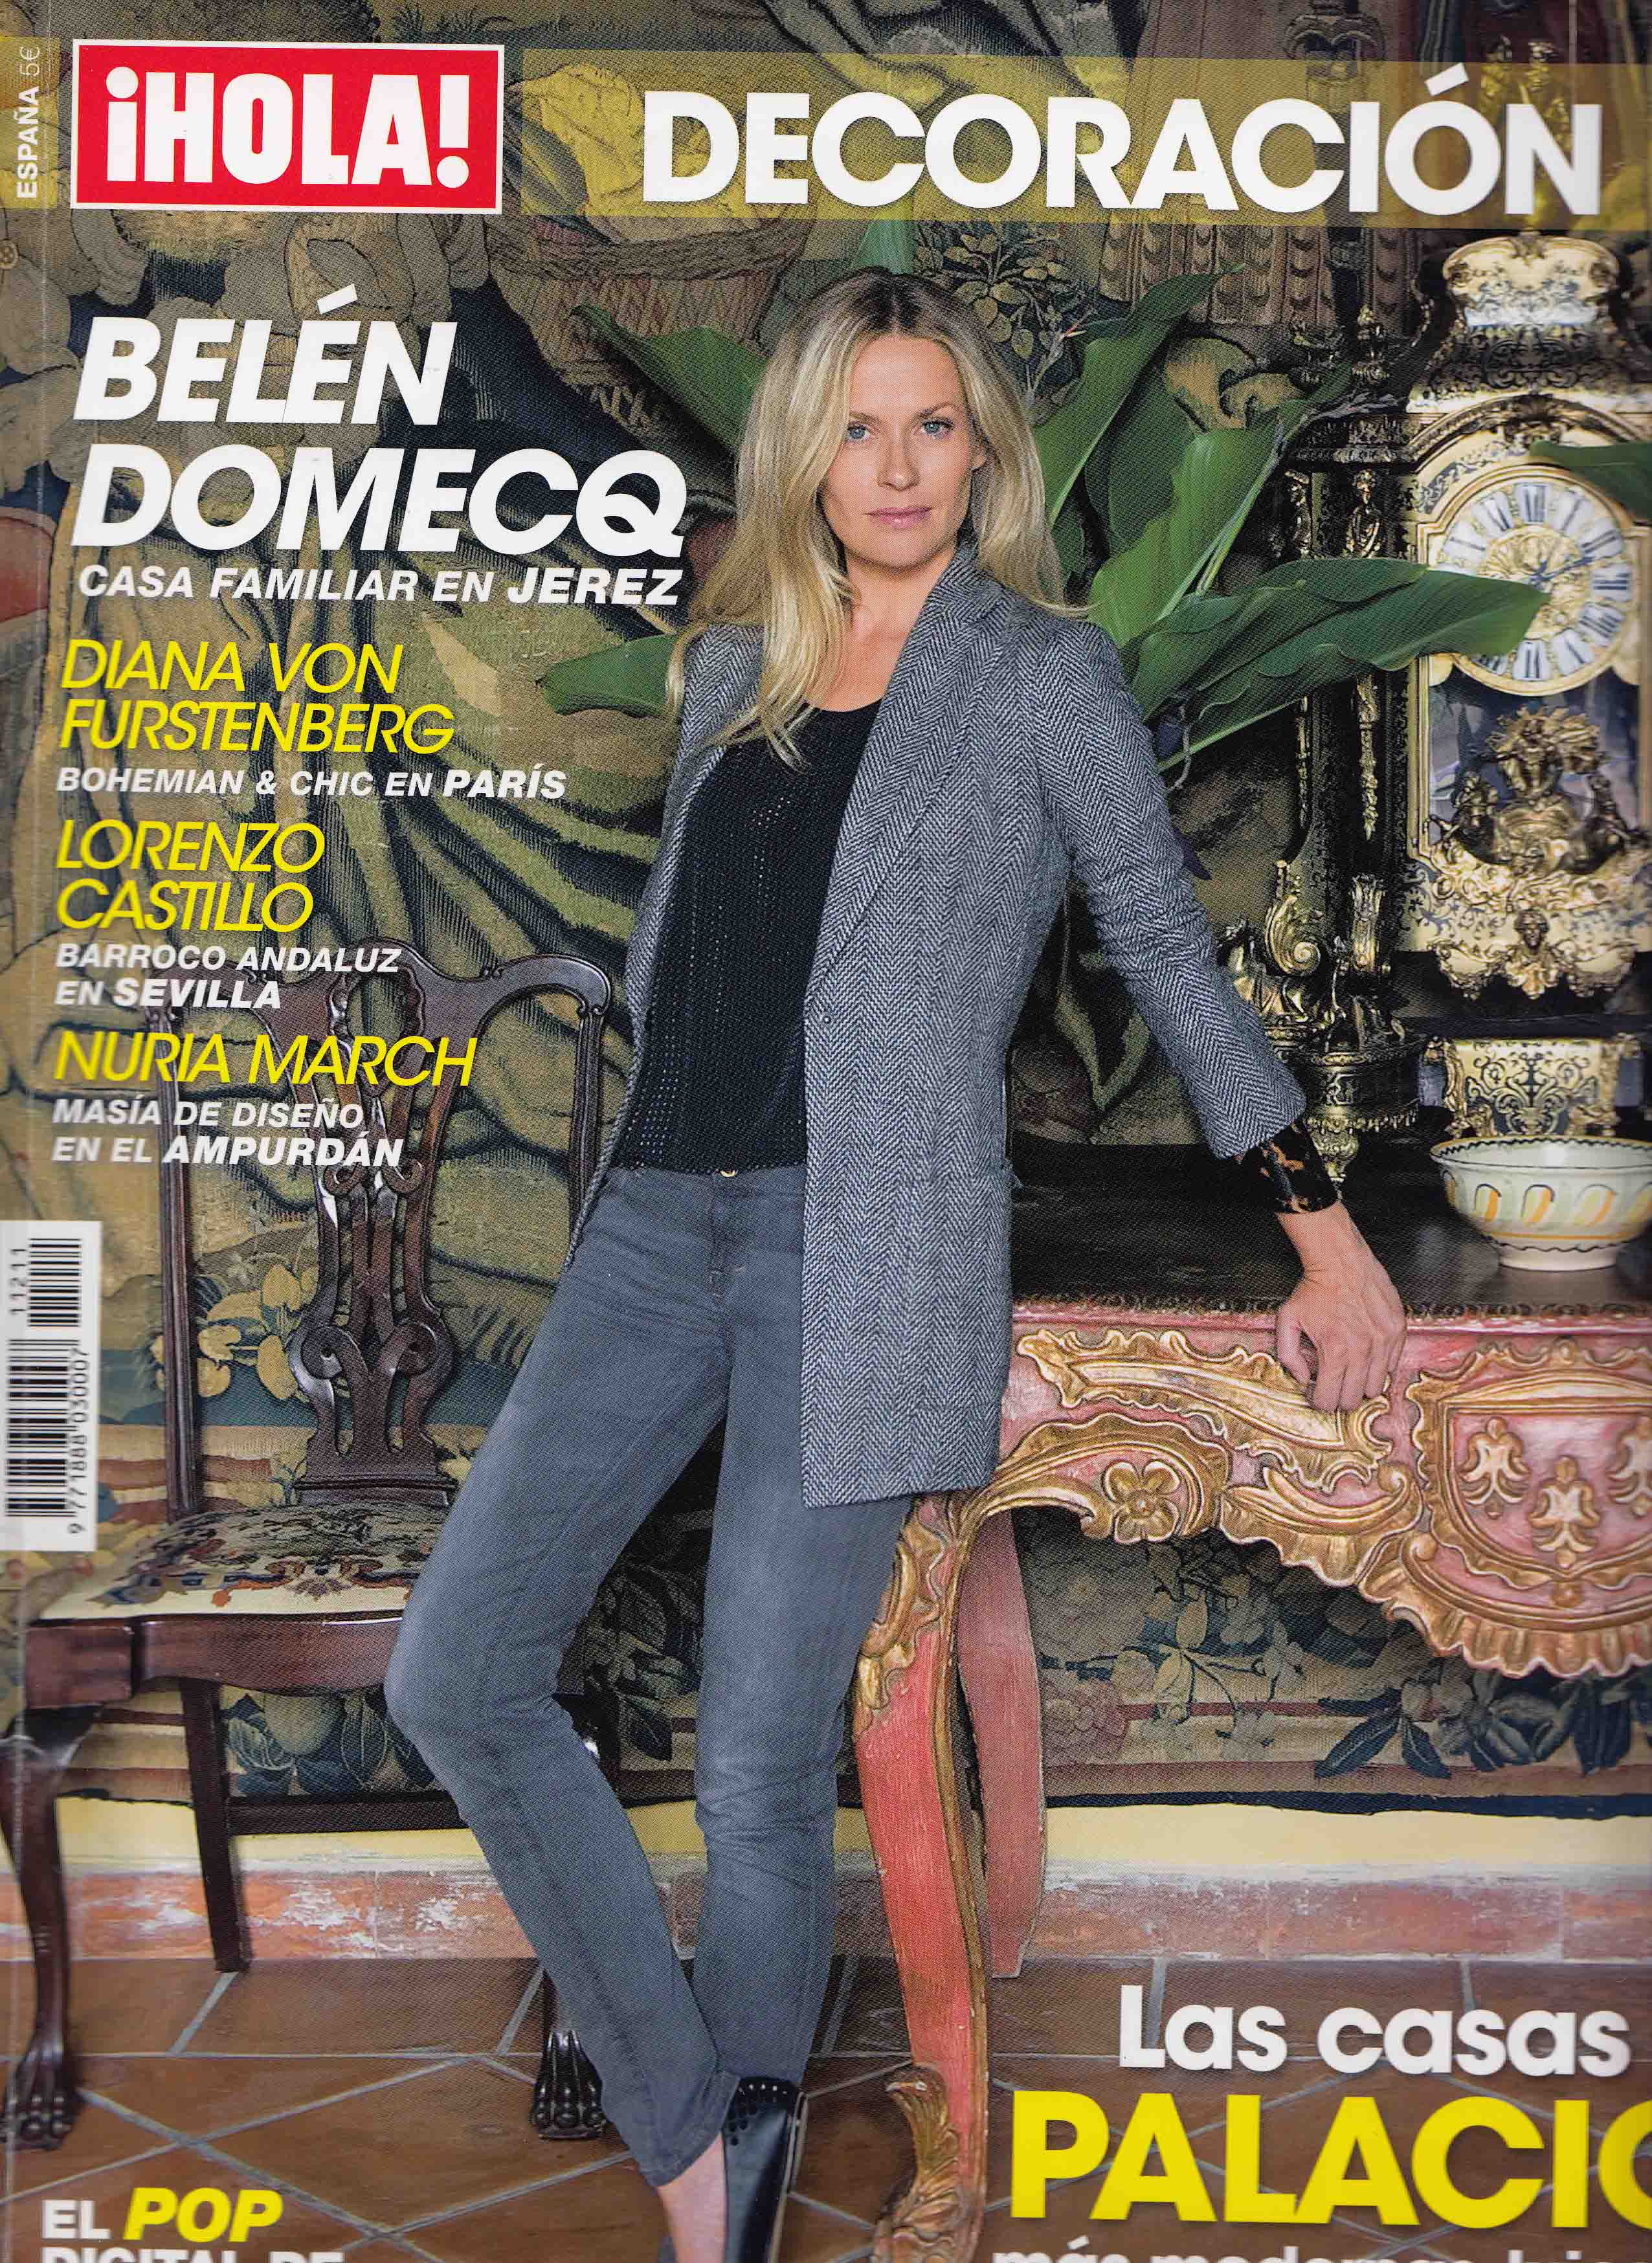 revista-hola-2013-melian_randolph-portada-0